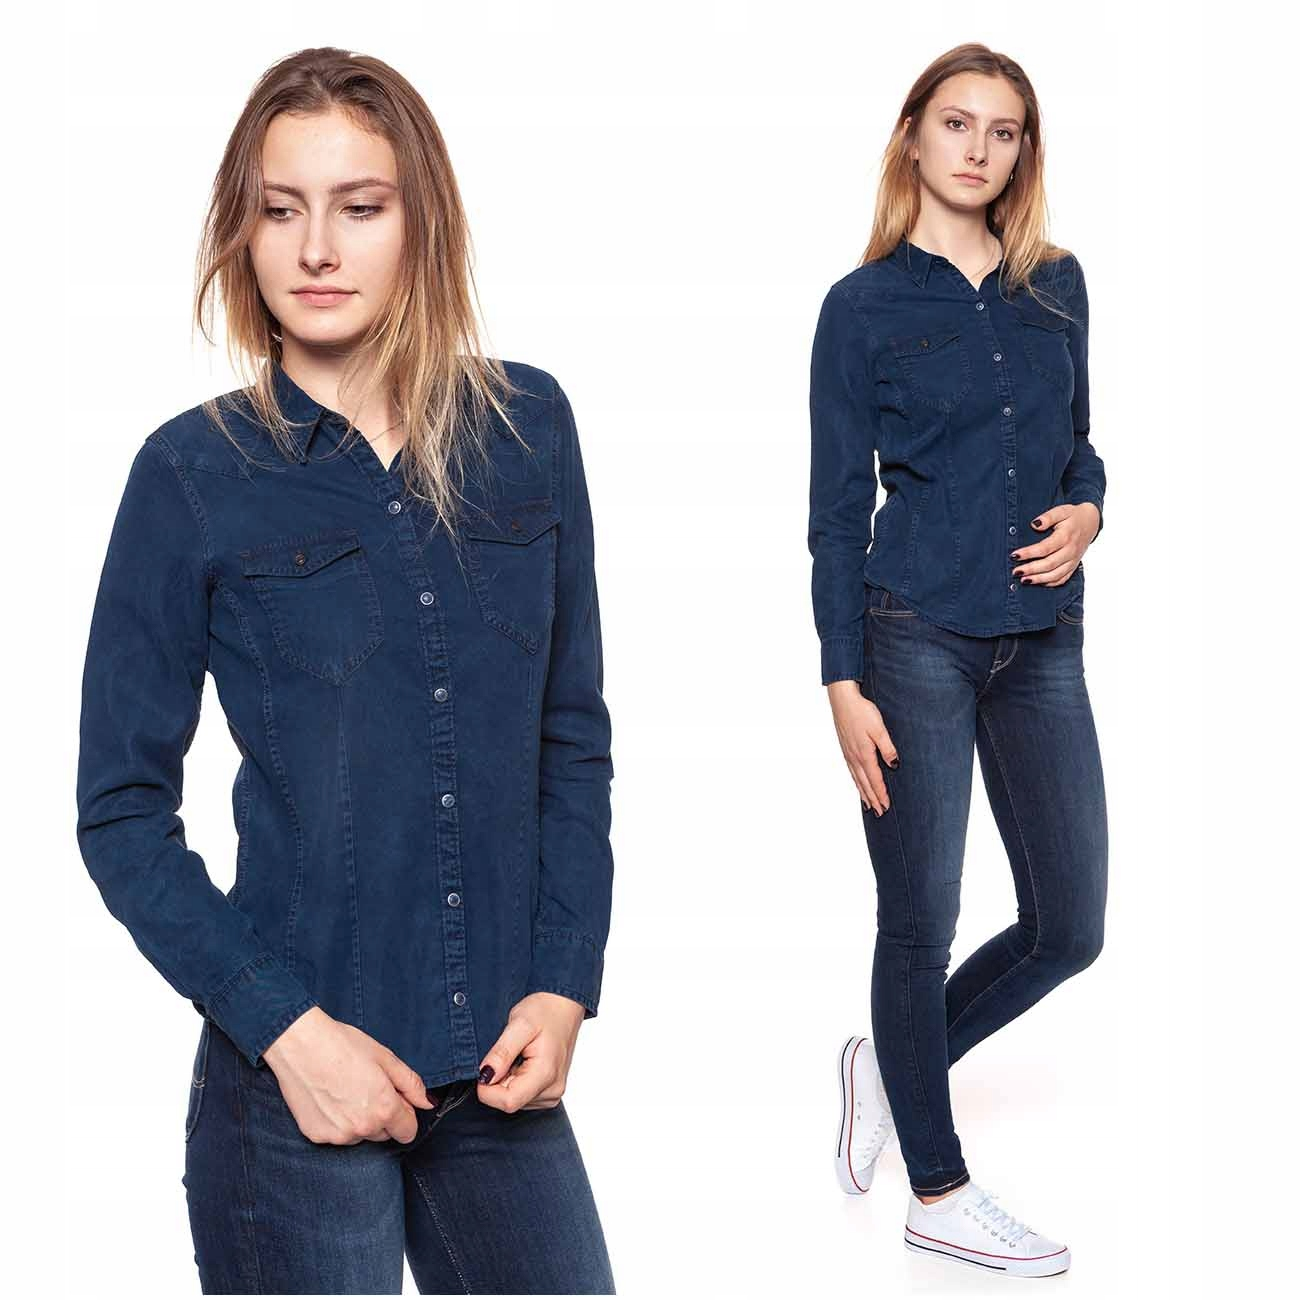 Wrangler Koszula Jeansowa Damska Bluzka Regular Xs